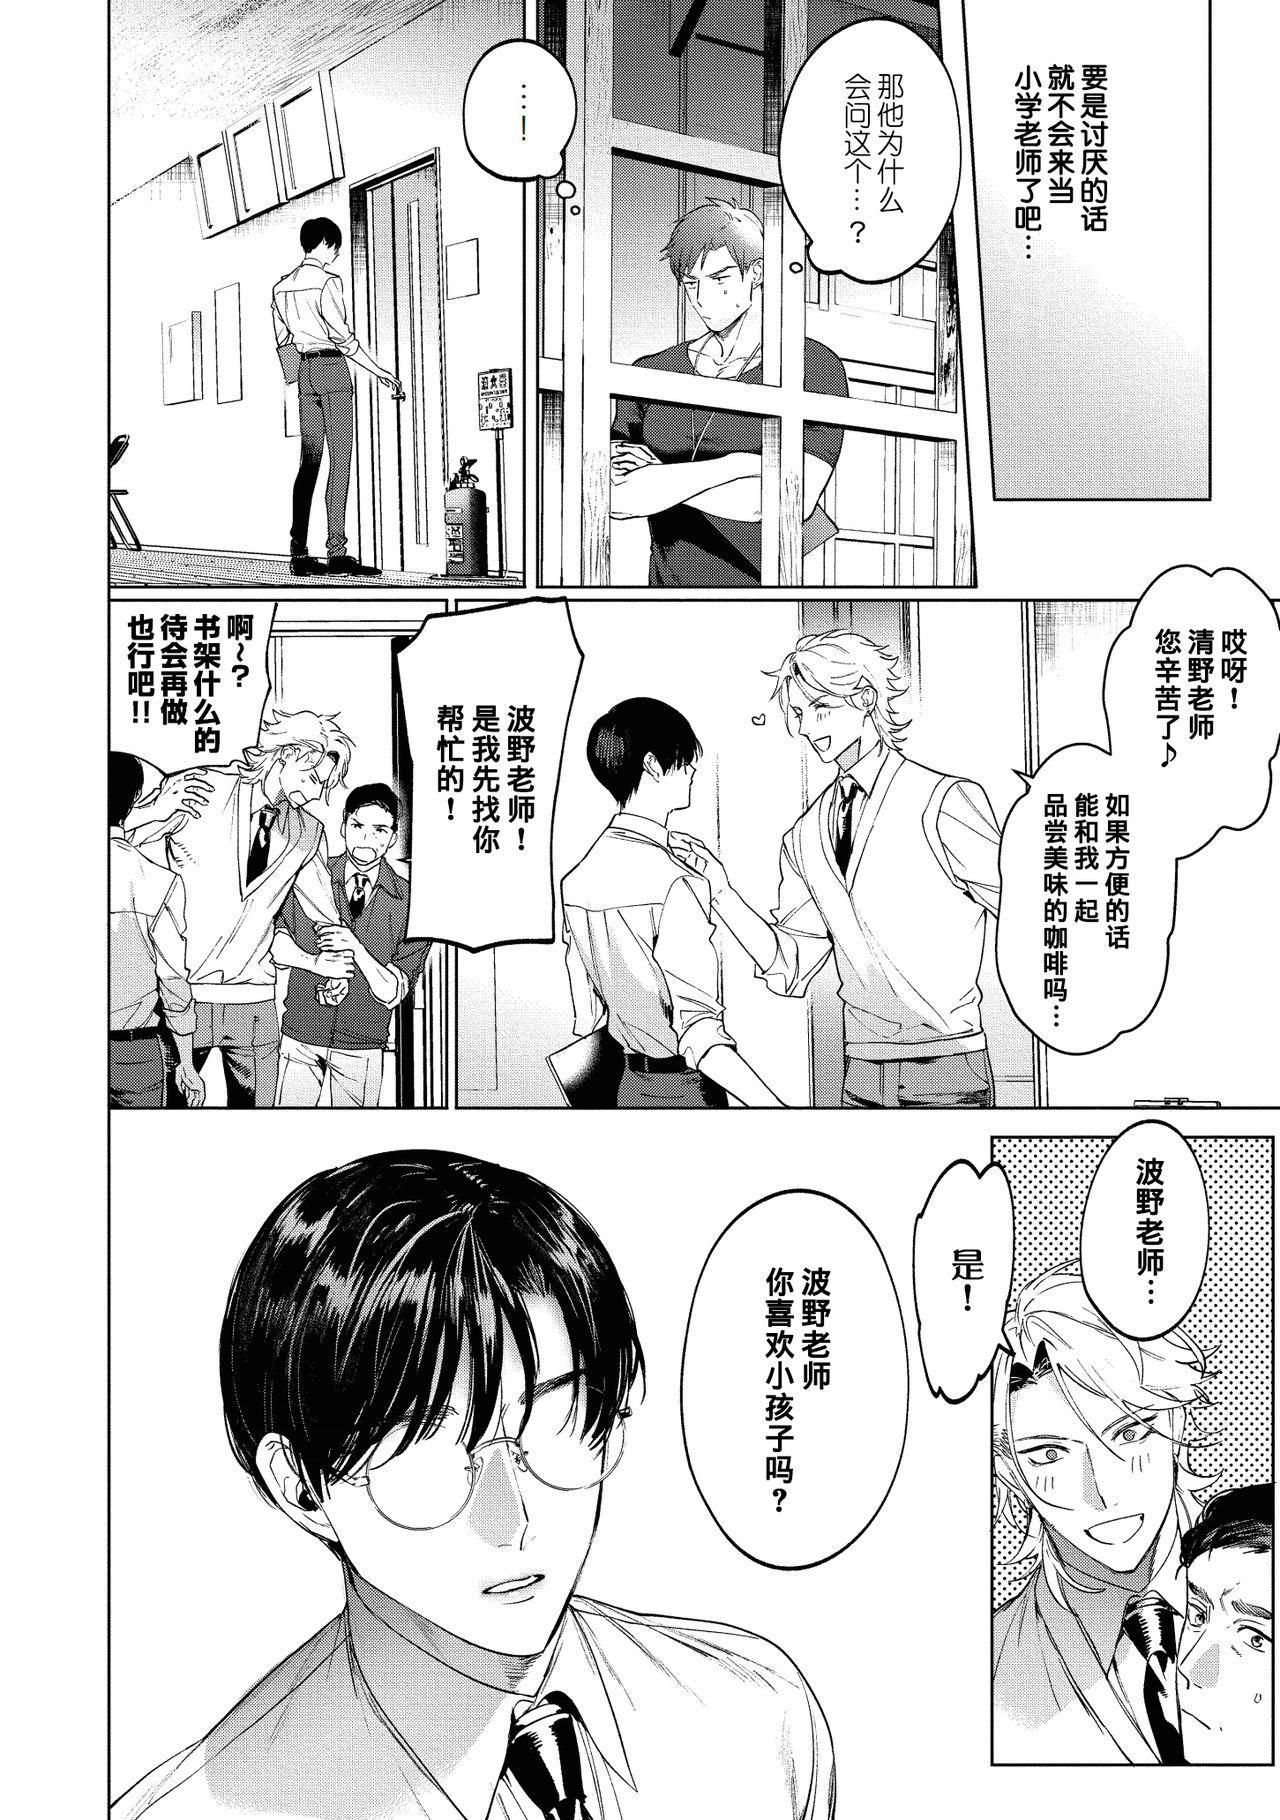 Sensei wa Benki ja Arimasen.3 | 老师不是便器。3 11